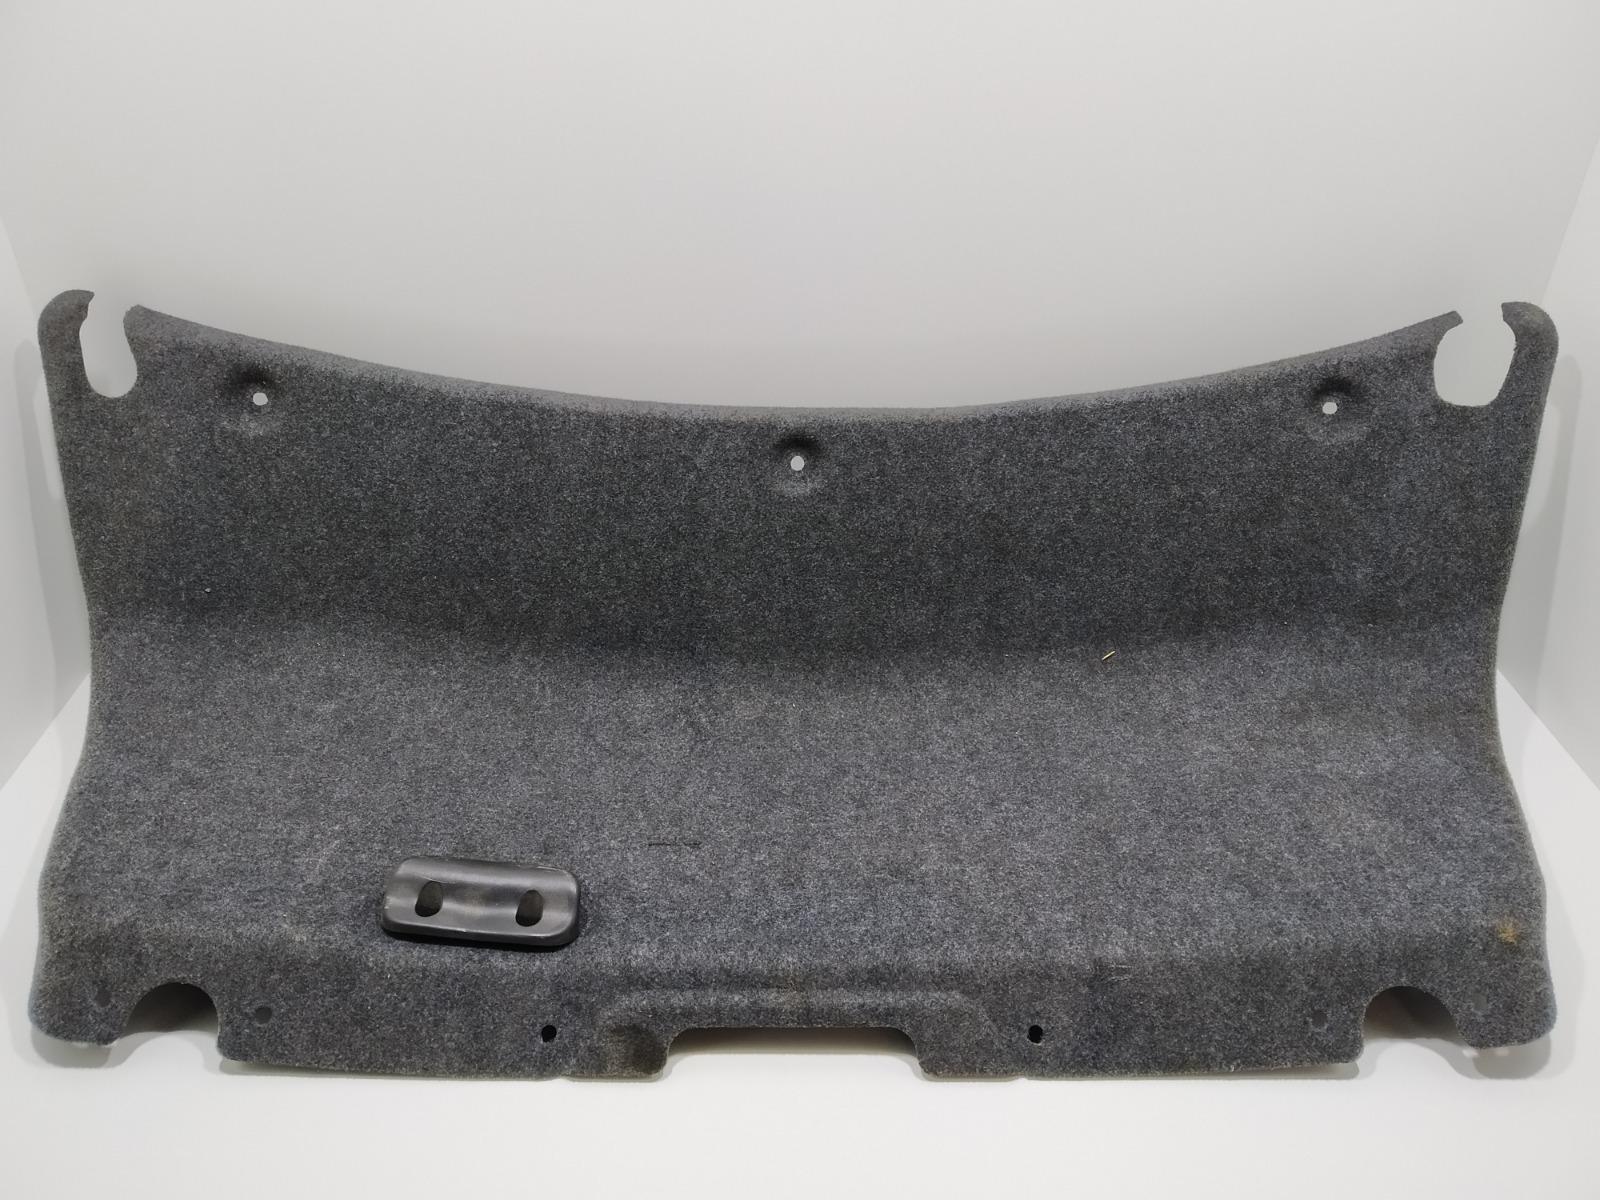 Обшивка крышки багажника Saab 9-3 2.0 TI 2005 (б/у)